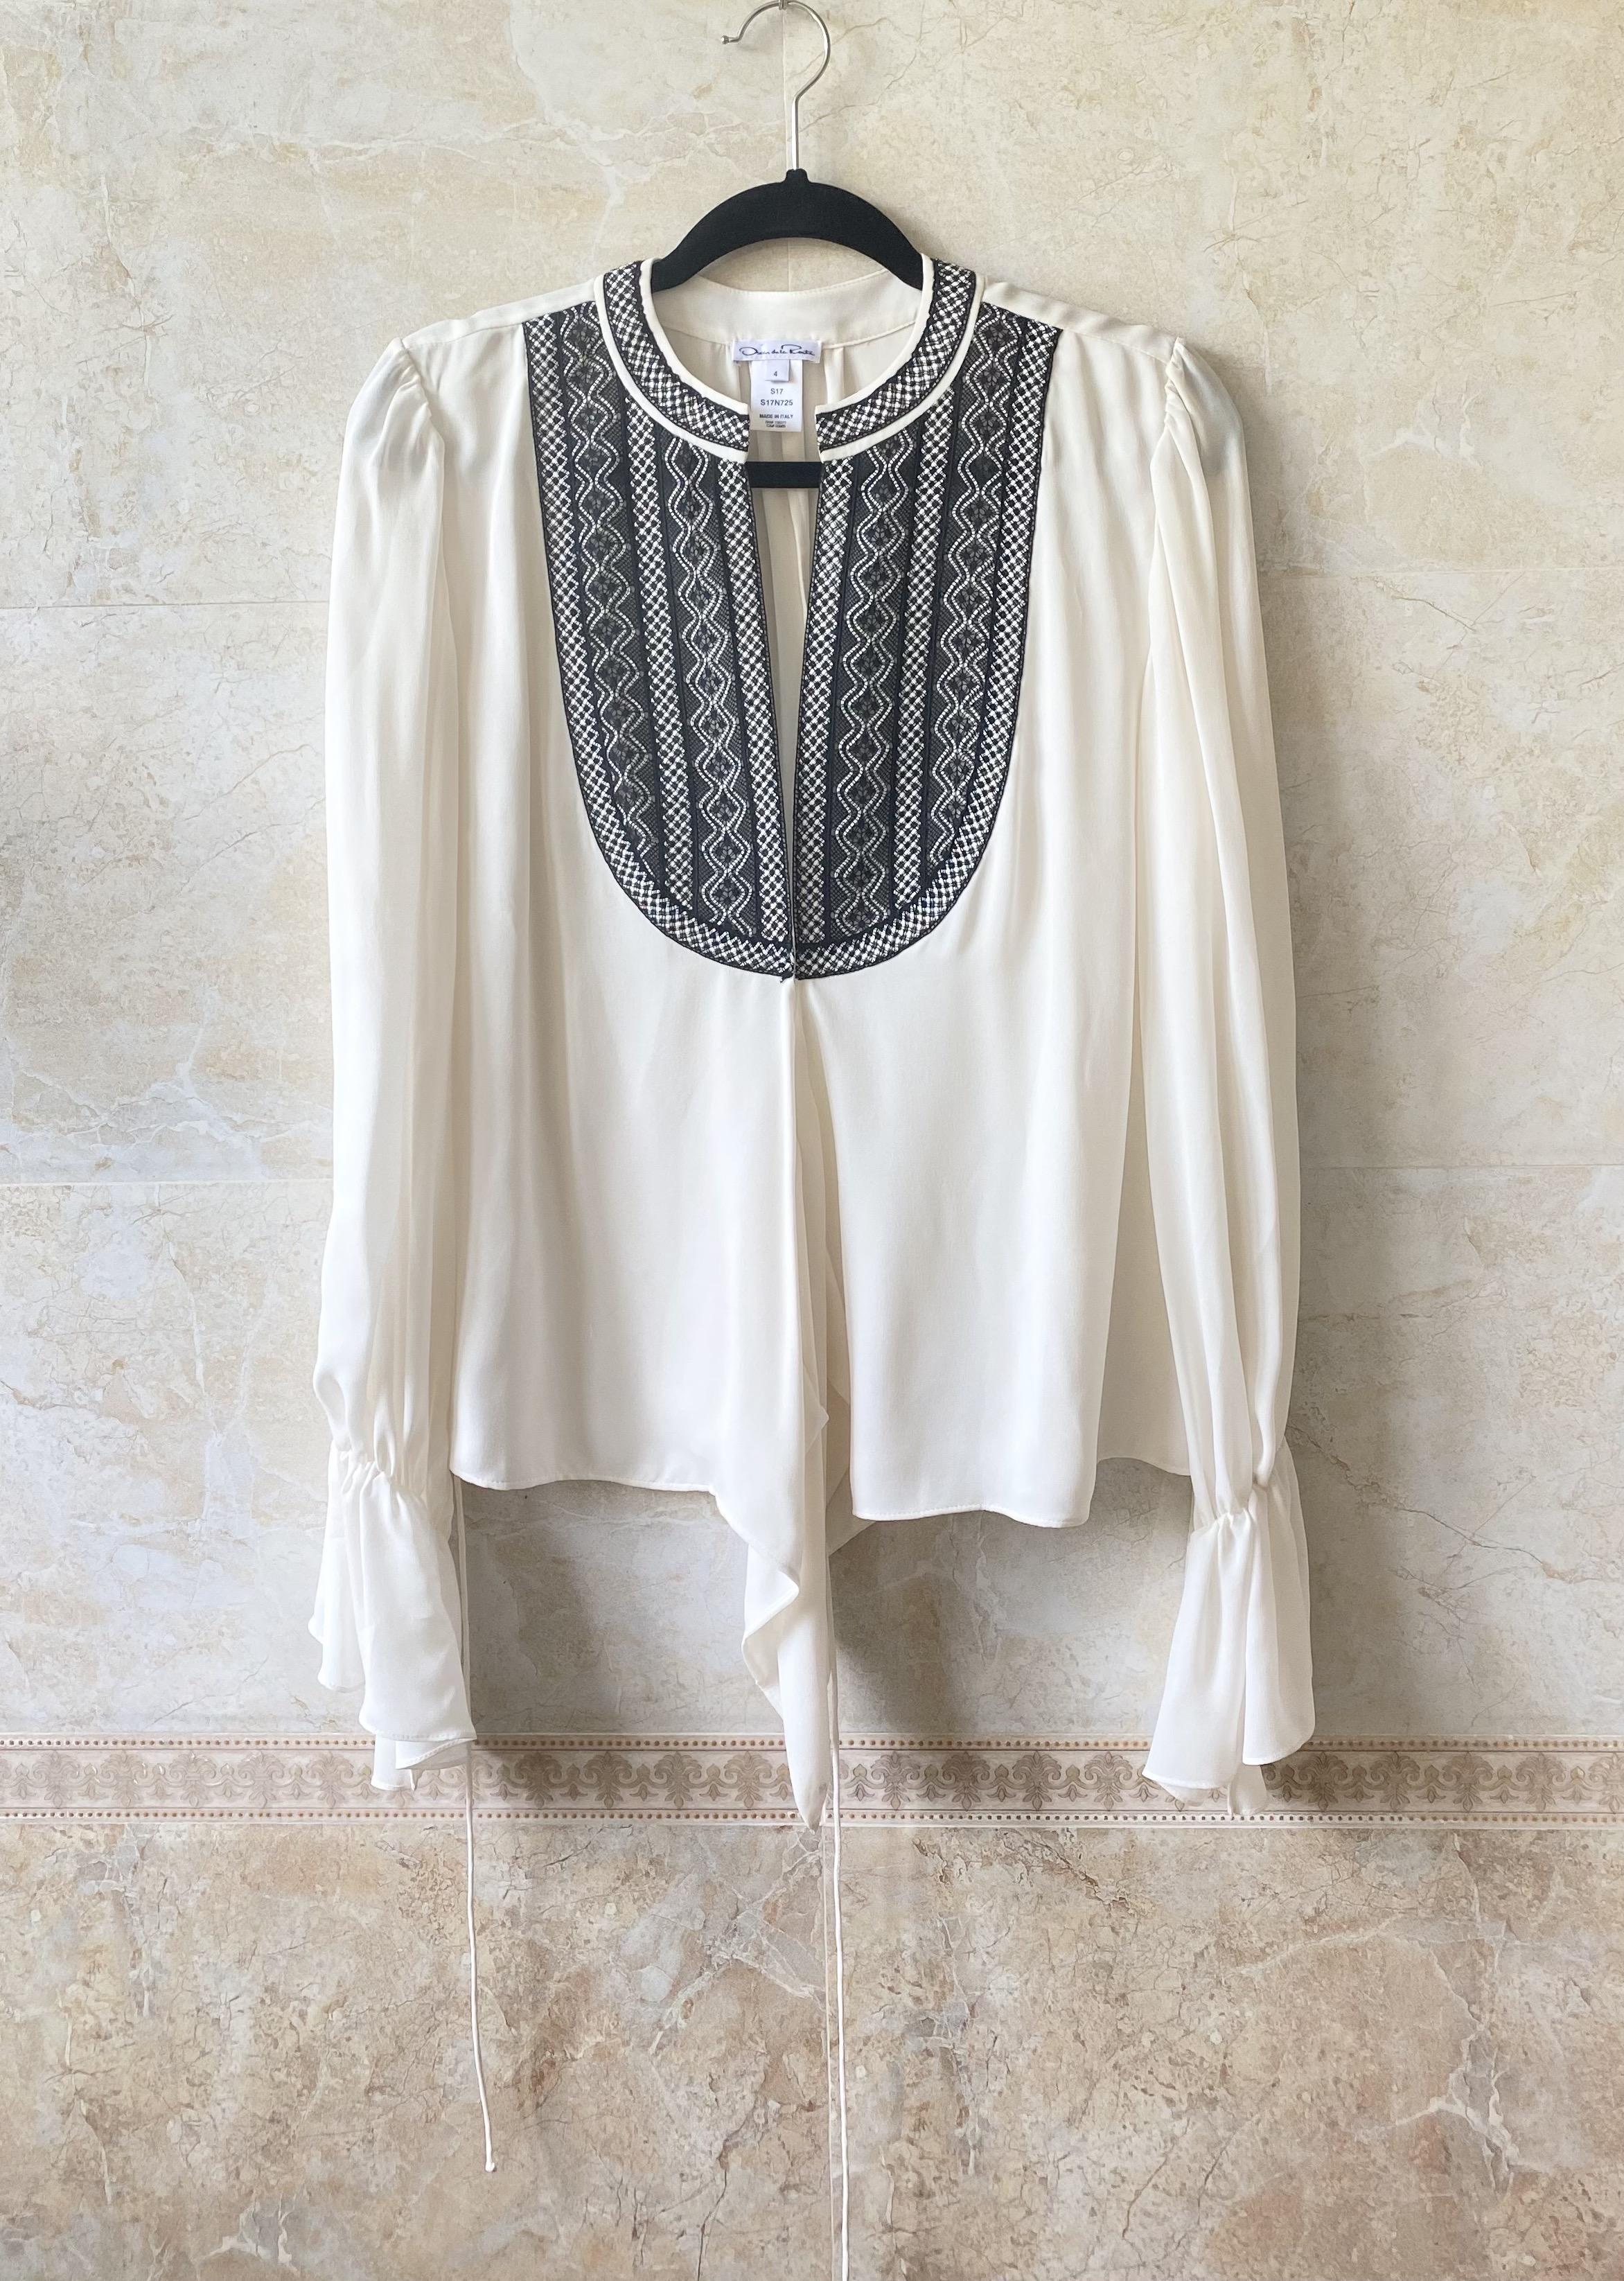 Oscar show water silk Ivory water sleeve Vintage Plaid Bohemian style shirt Renta